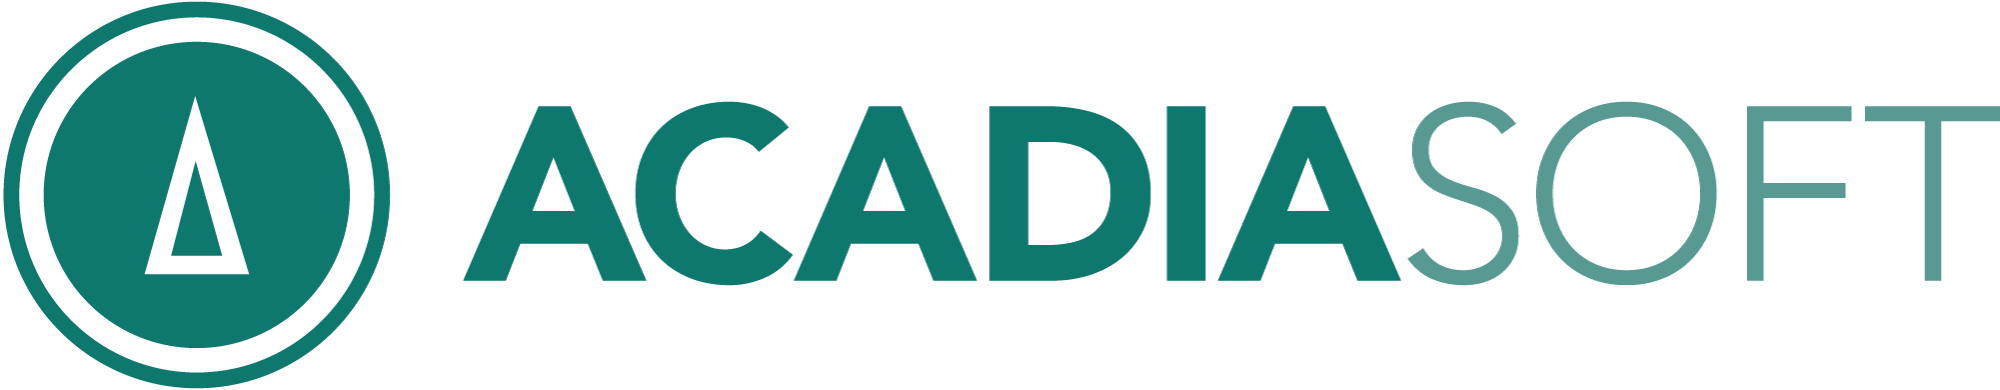 AcadiaSoft